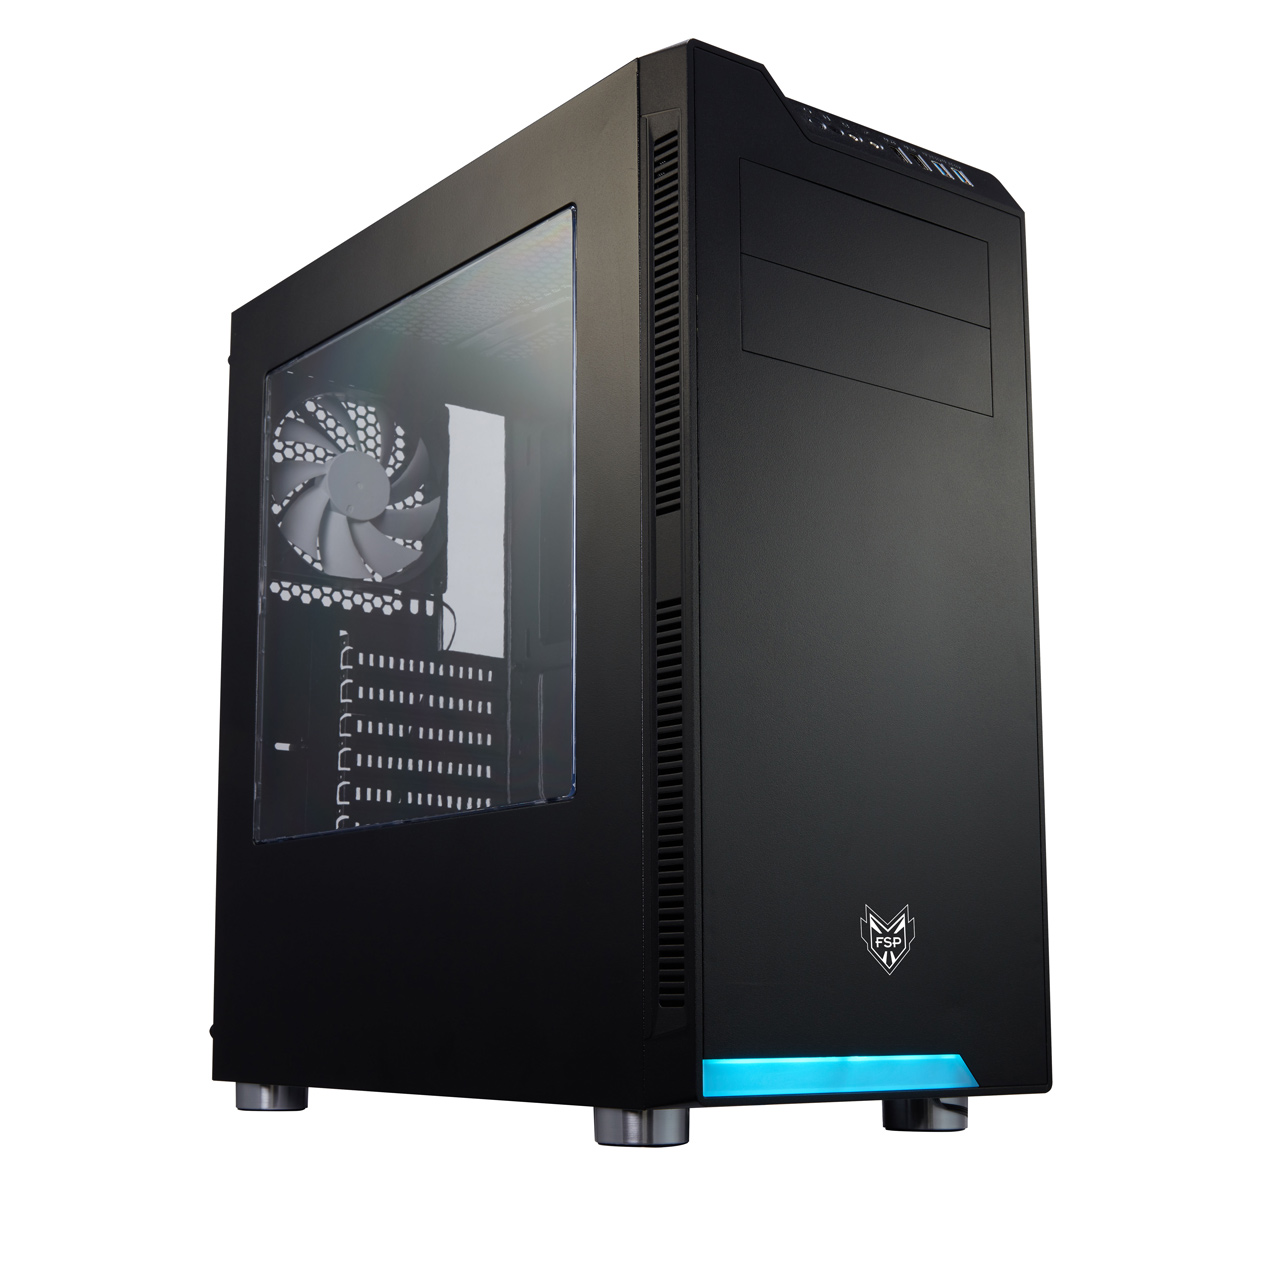 FSP/Fortron ATX Midi Tower CMT240 Black, průhledná bočnice - POC0000029